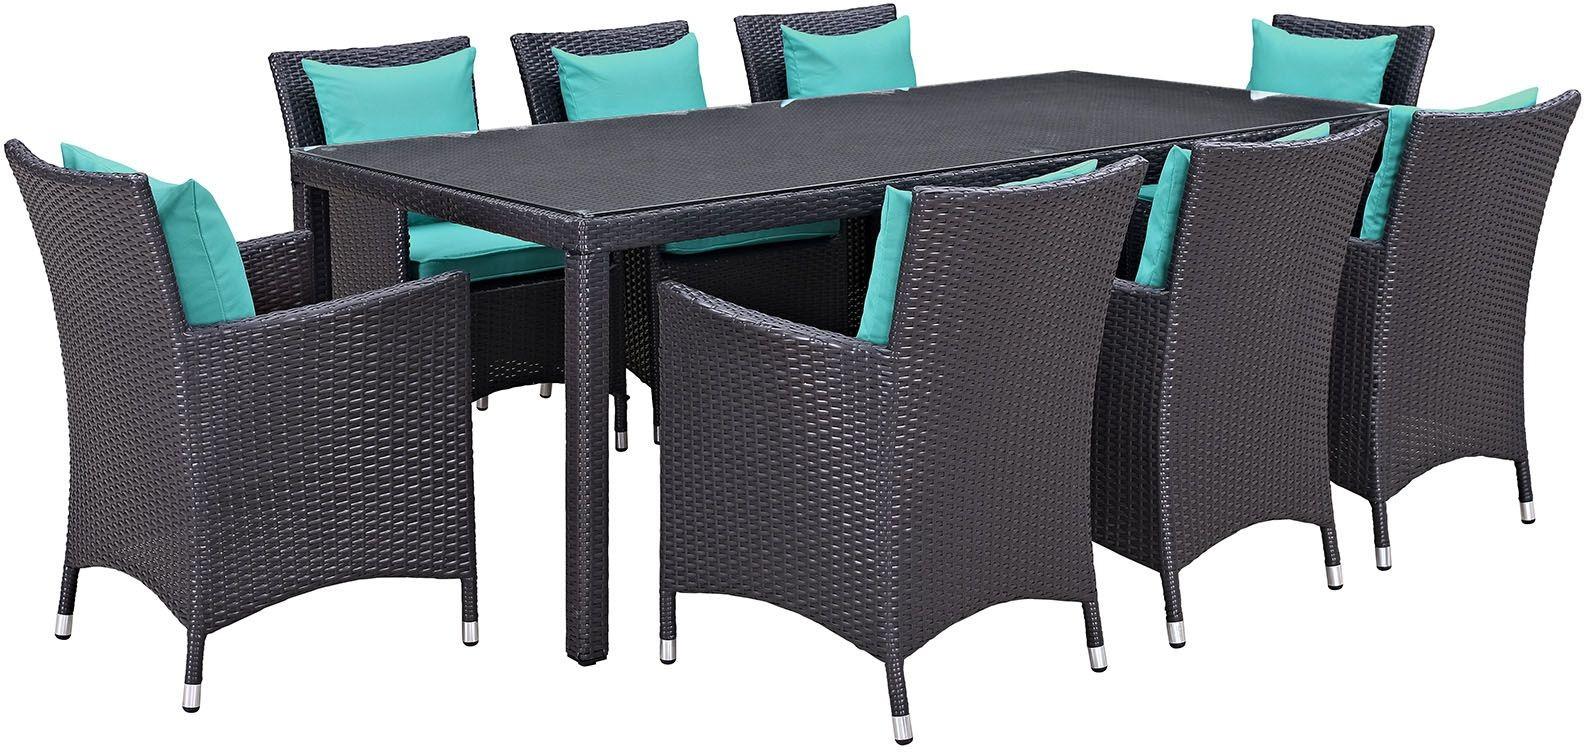 Convene espresso turquoise 9 piece outdoor patio dining for Outdoor furniture 9 piece